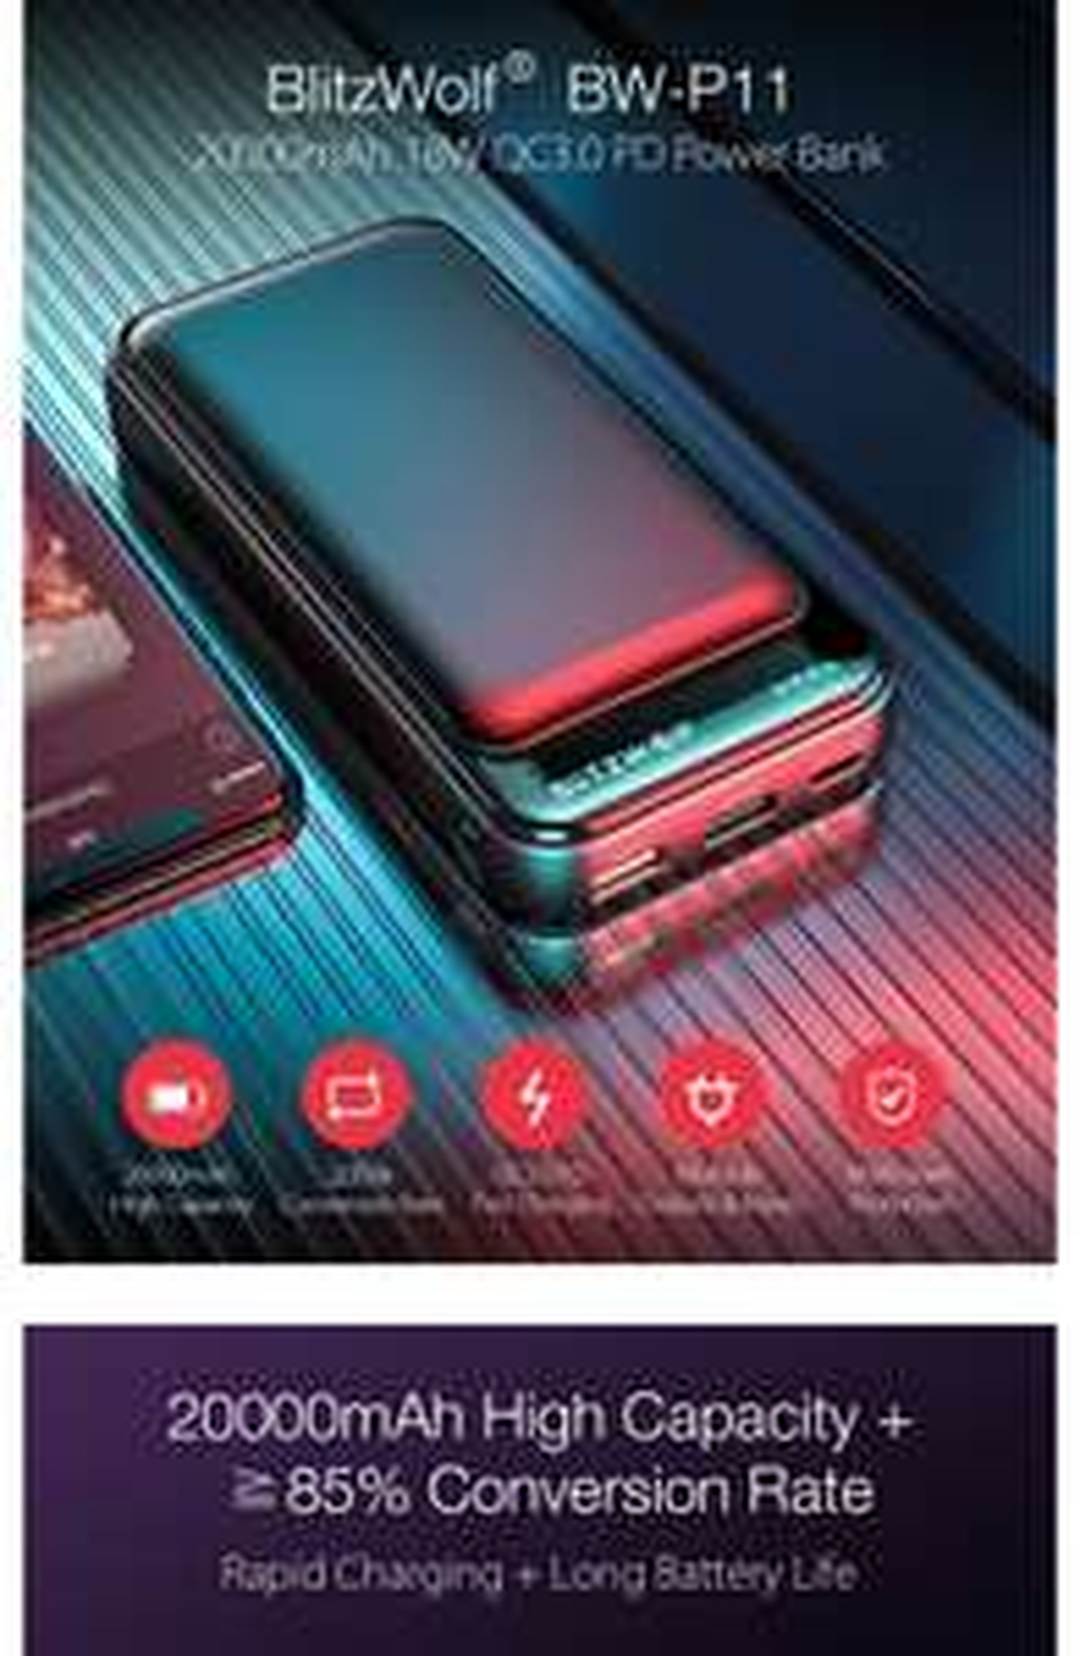 BlitzWolf® BW-P11 20000mAh 18W QC3.0 Powerbank